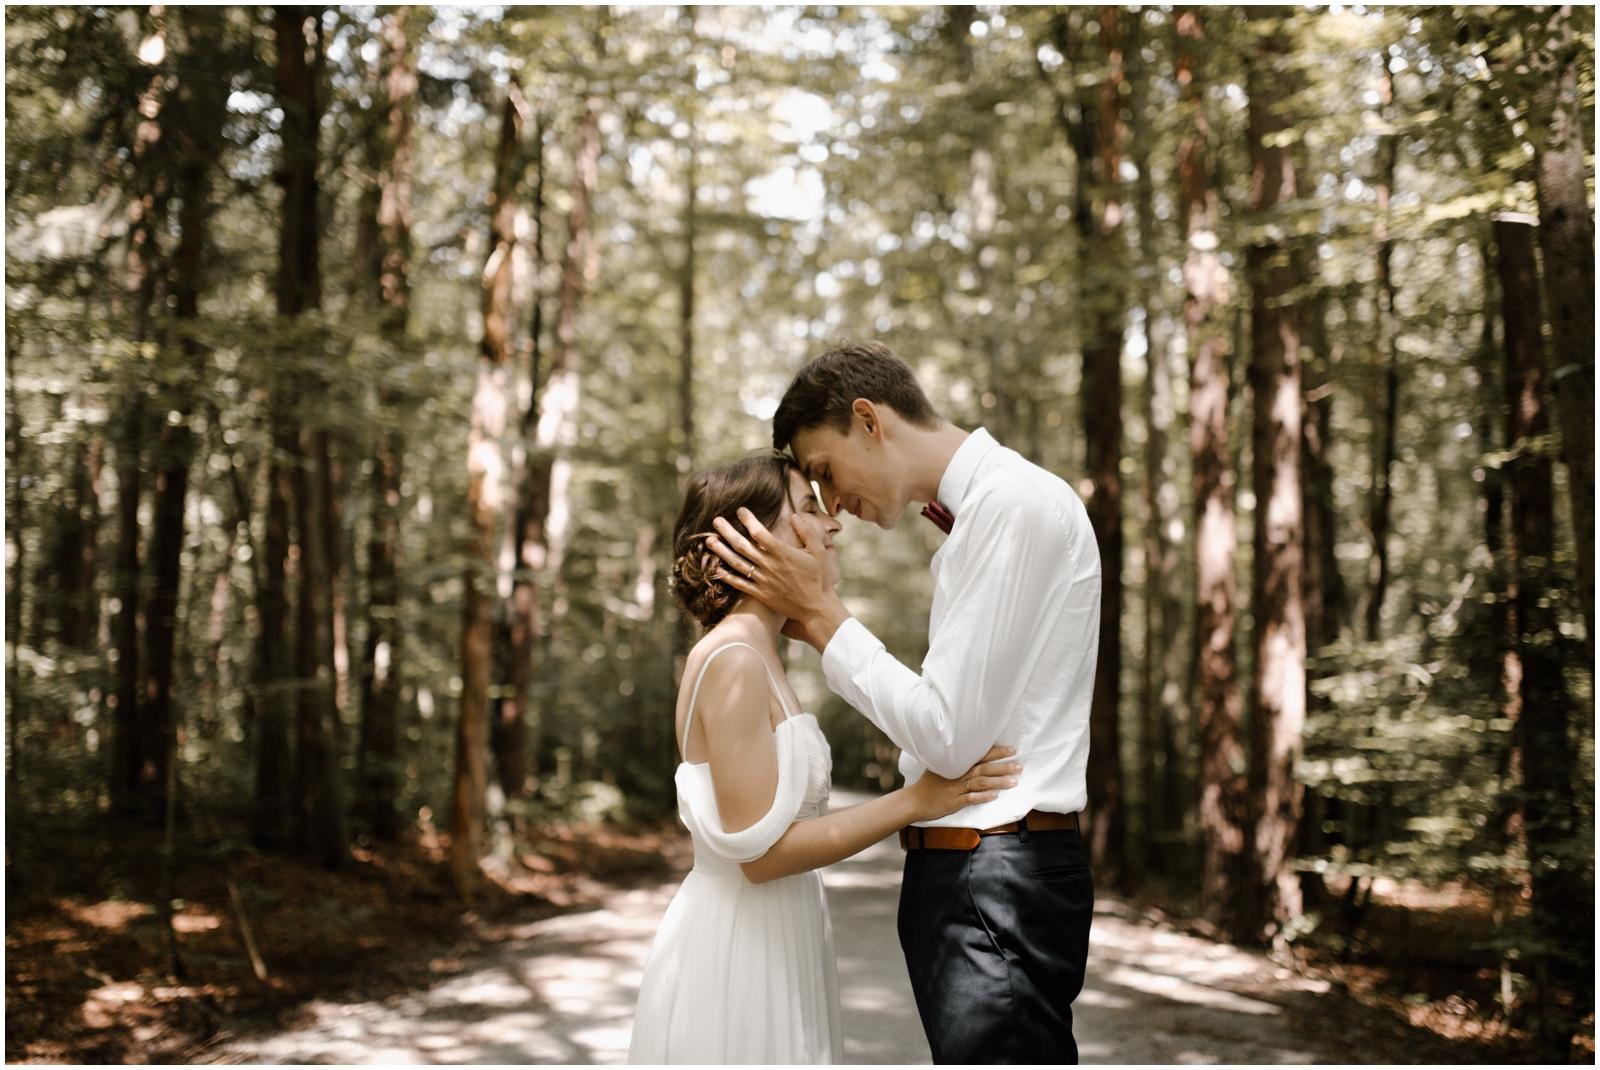 mirjam_thomas_wedding-224.jpg